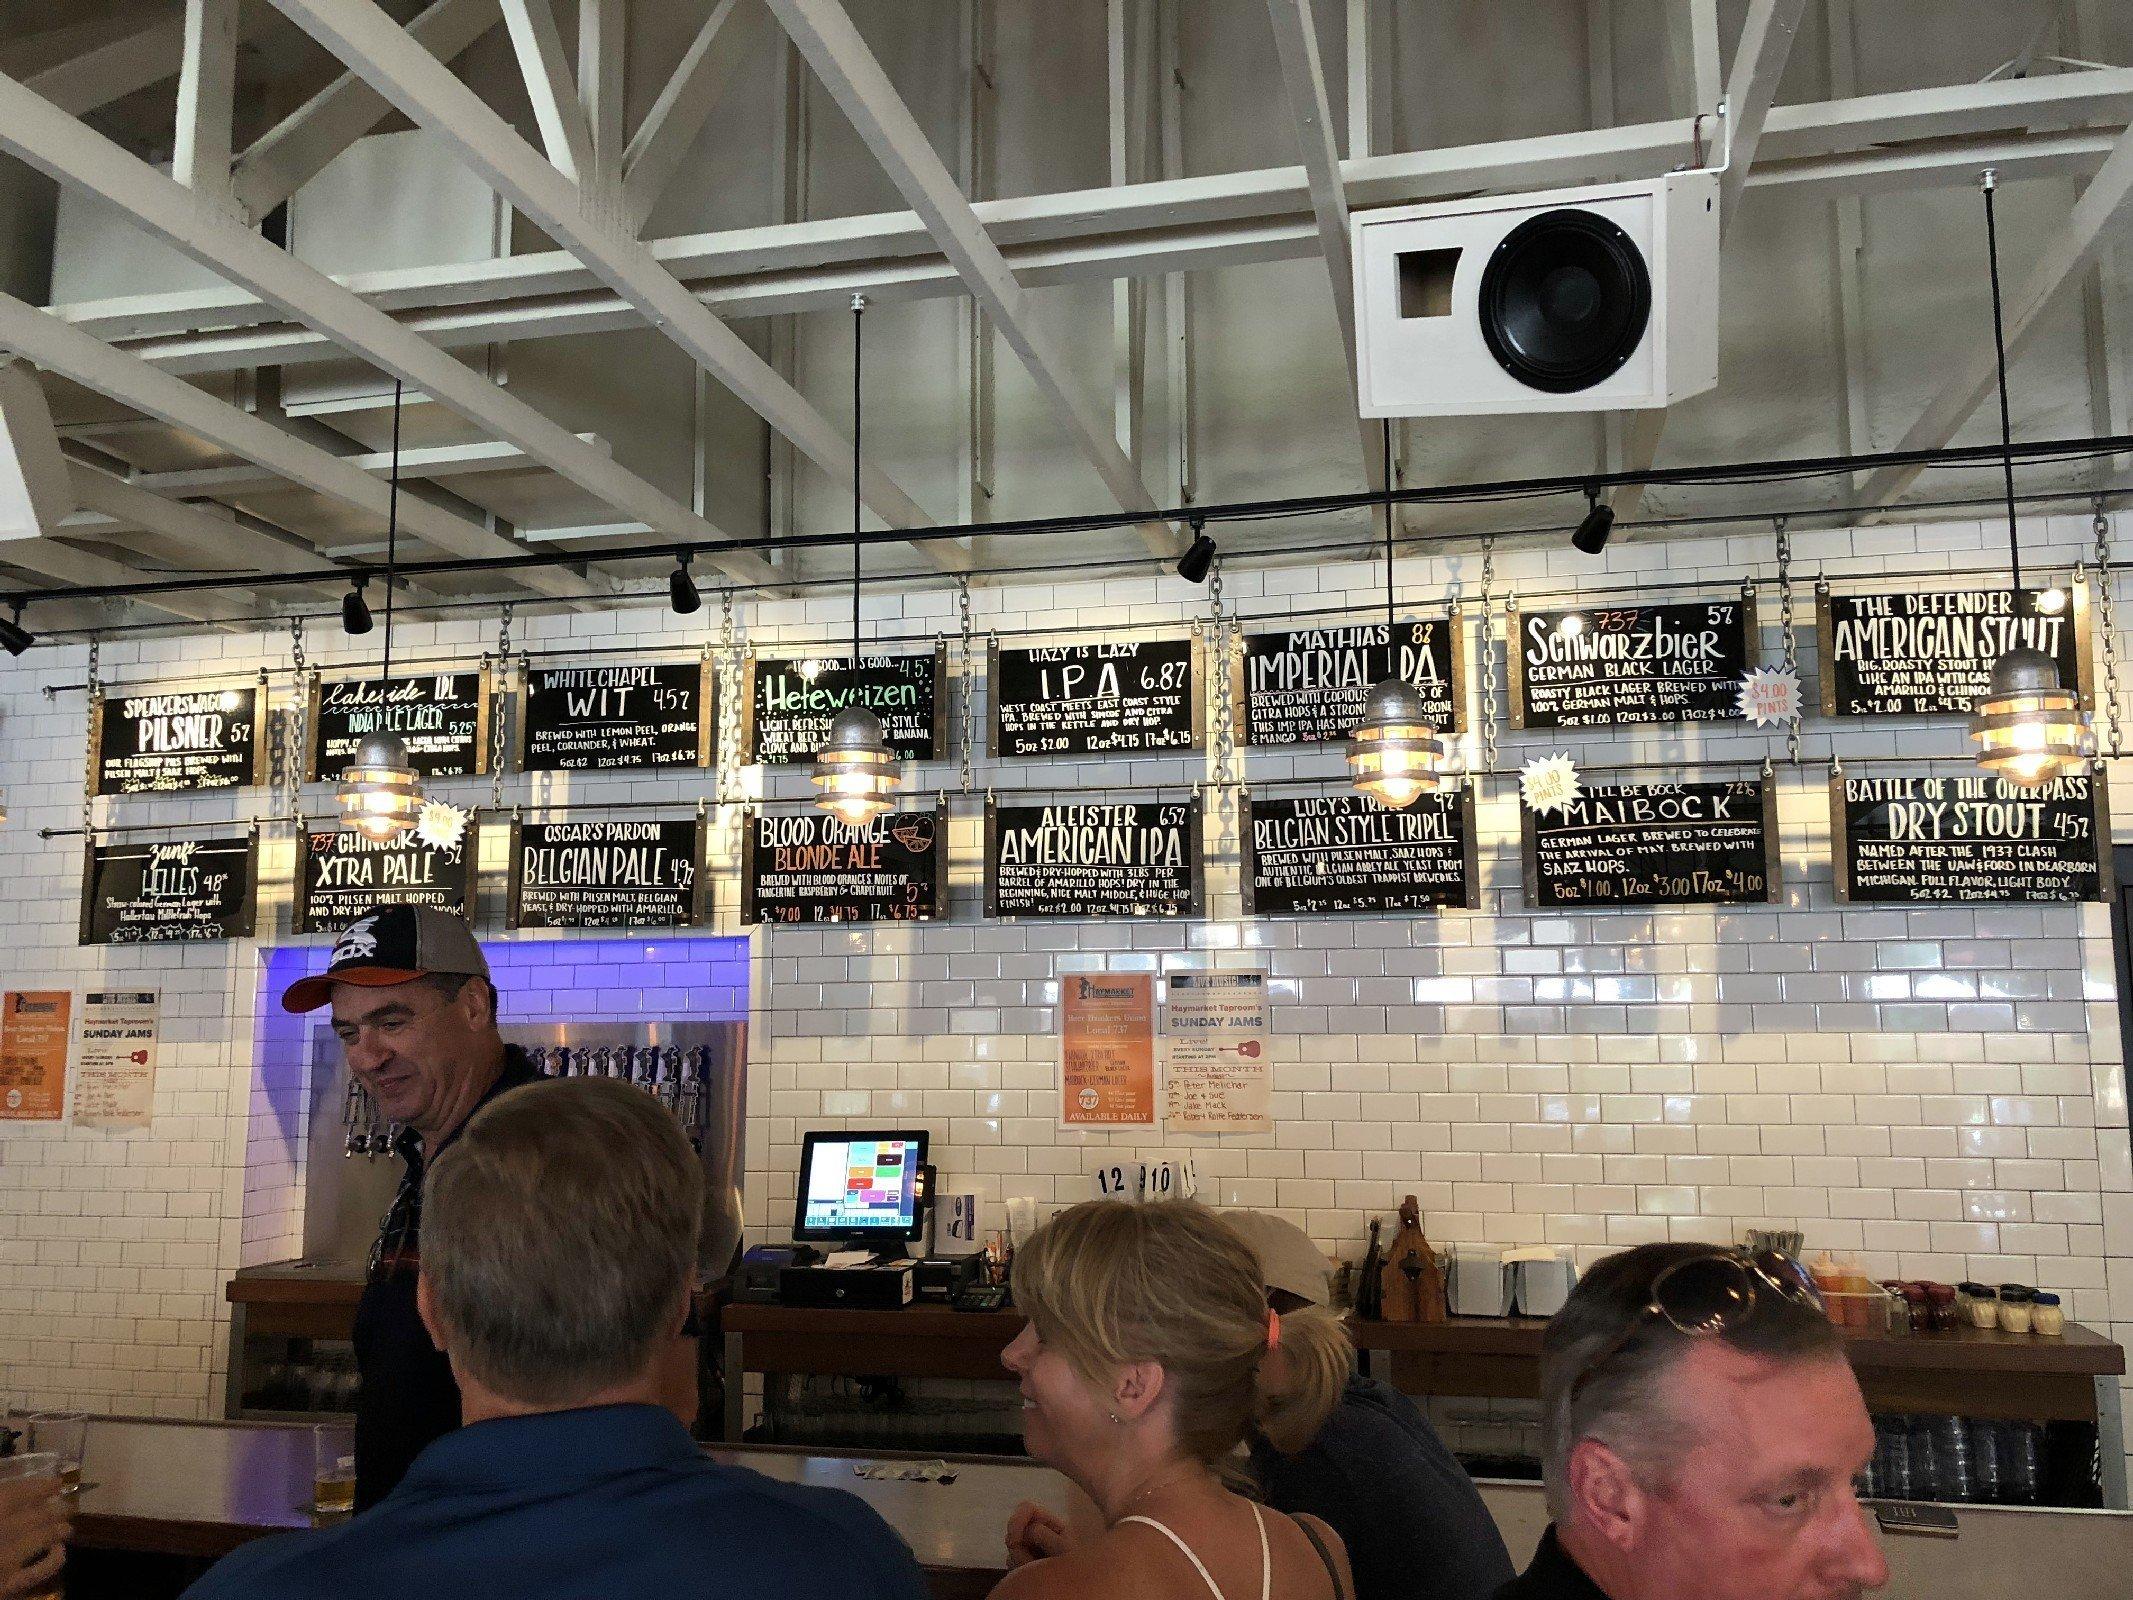 Haymarket Brewery in Bridgman, MI by Jets Like Taxis / Hopsmash